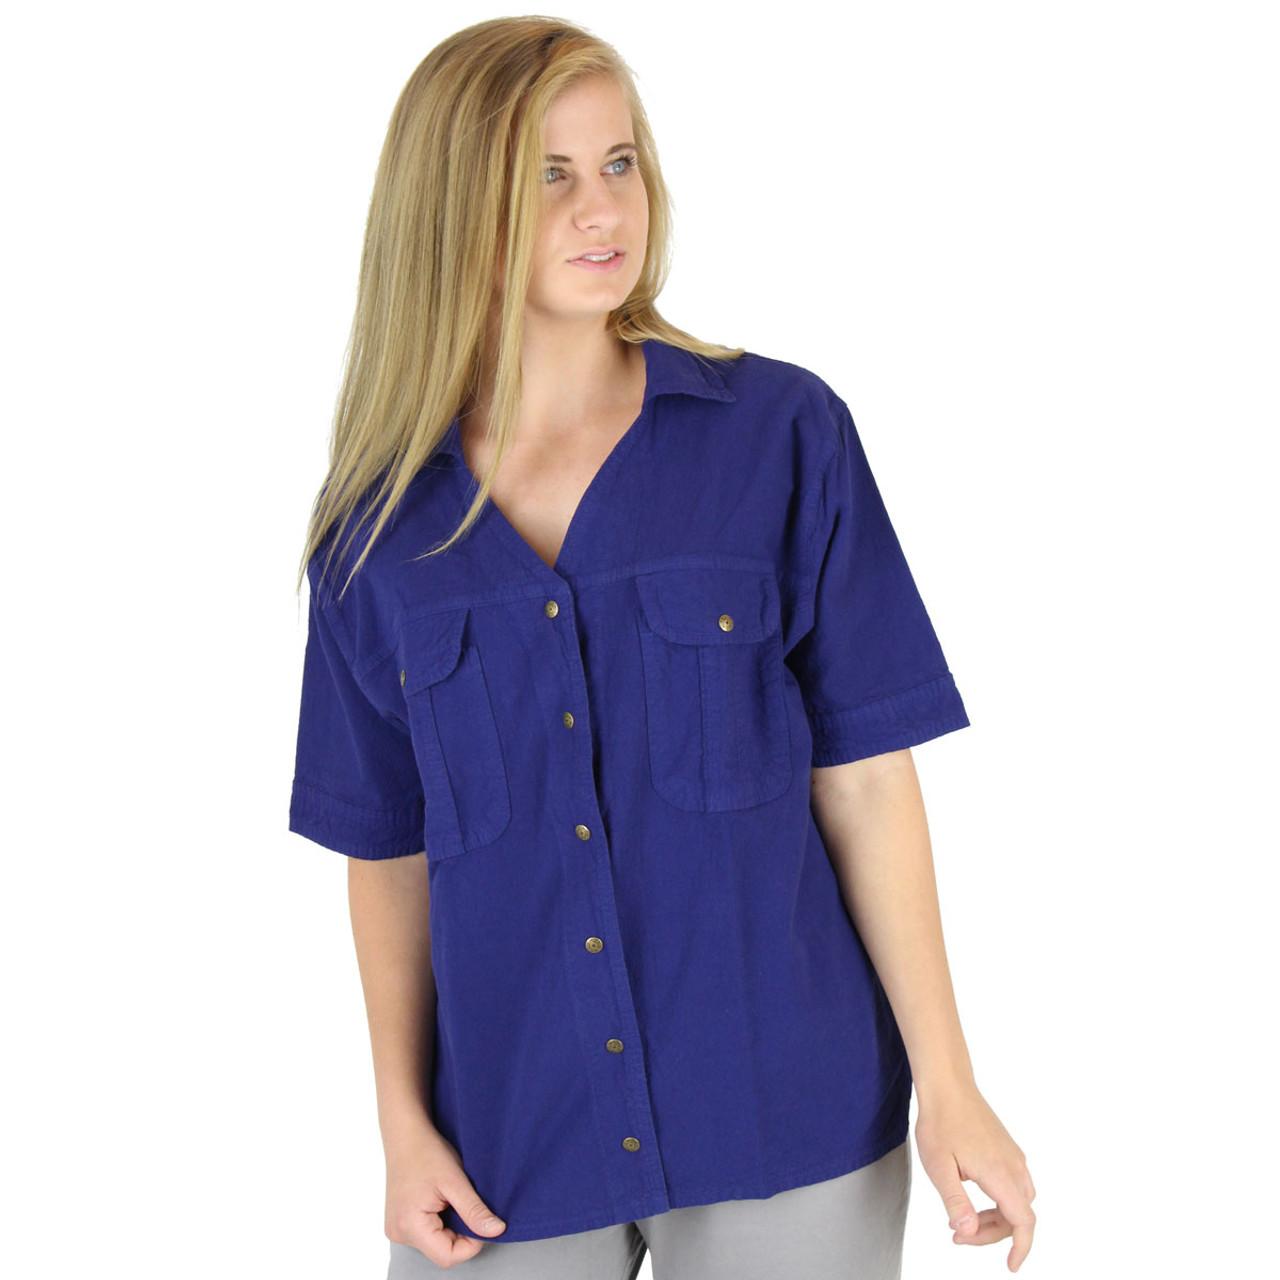 5a45f73f9 Cotton Camp Shirt | Crinkle Cotton